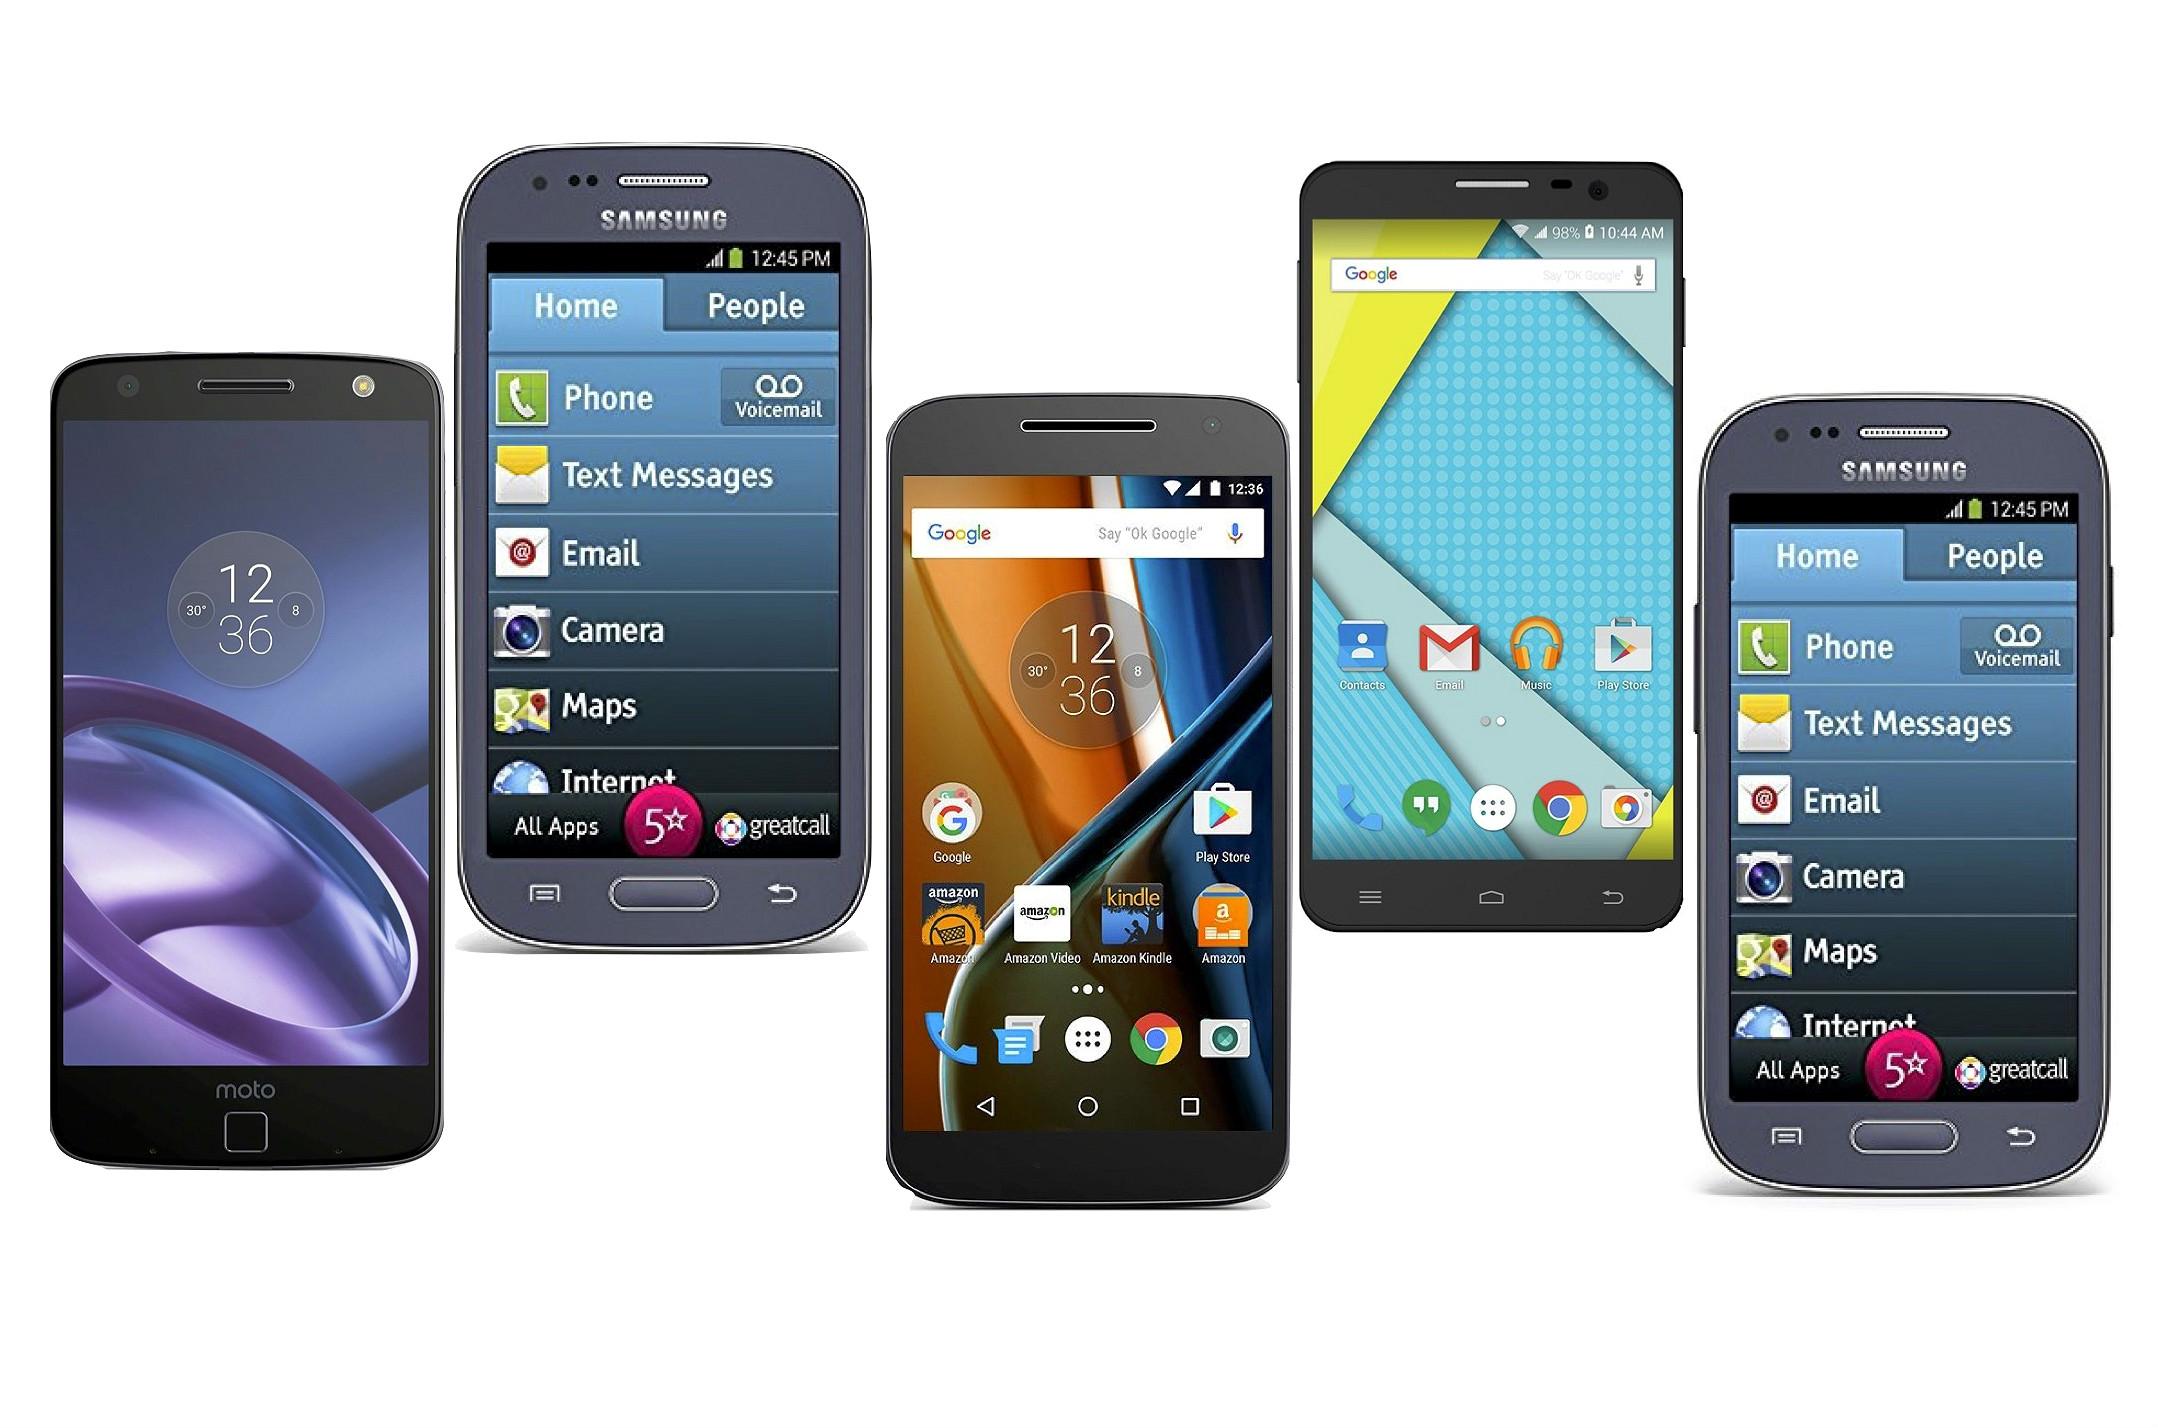 cyber monday, cyber monday deals, best cyber monday deals, cyber monday sales, cyber monday cell phones